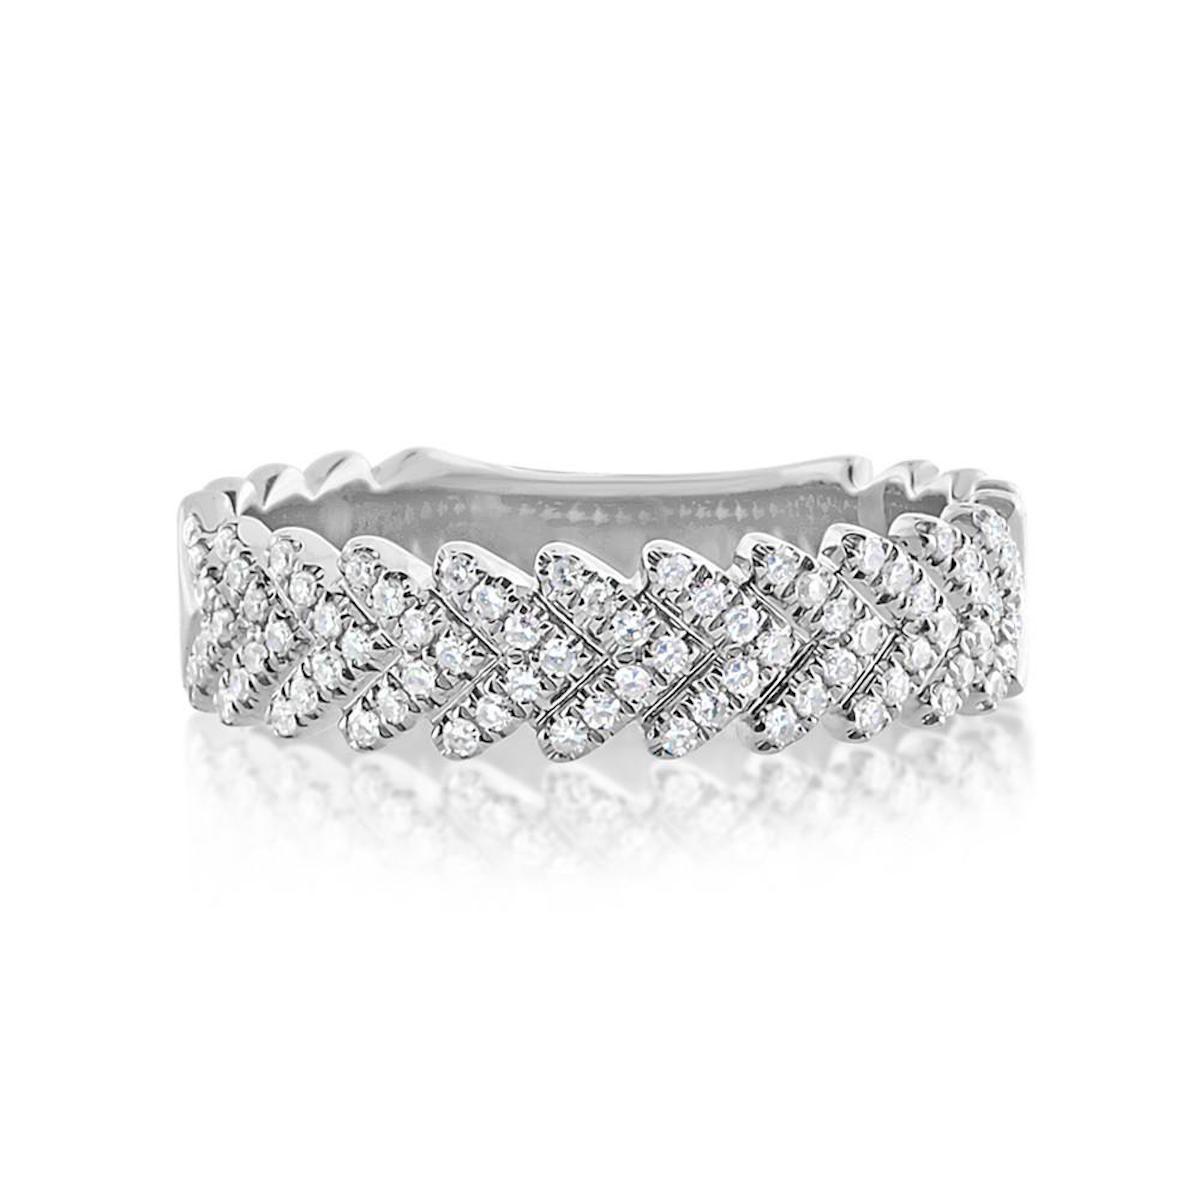 J. Luu Diamond Chevron Ring White Gold